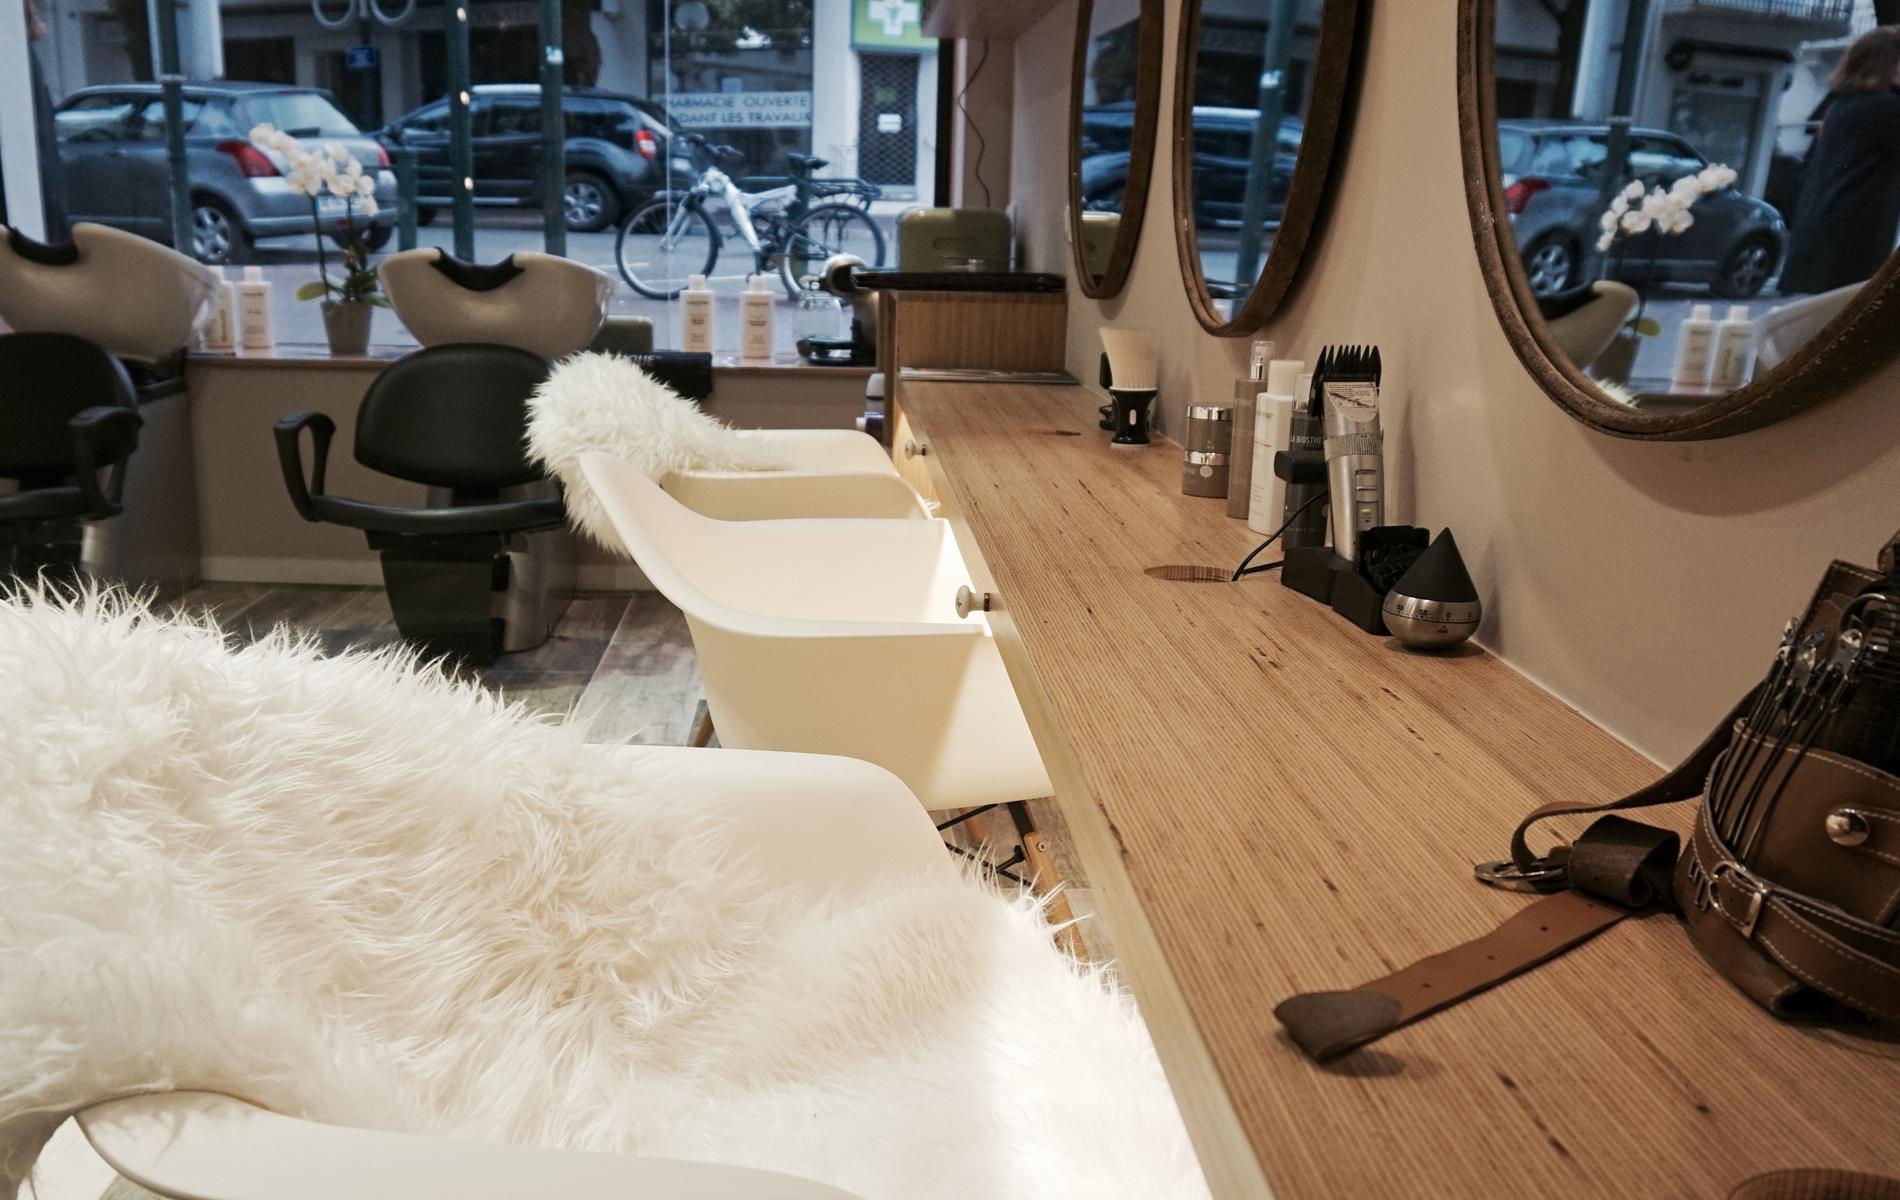 salon-de-coiffure-olazabal-1